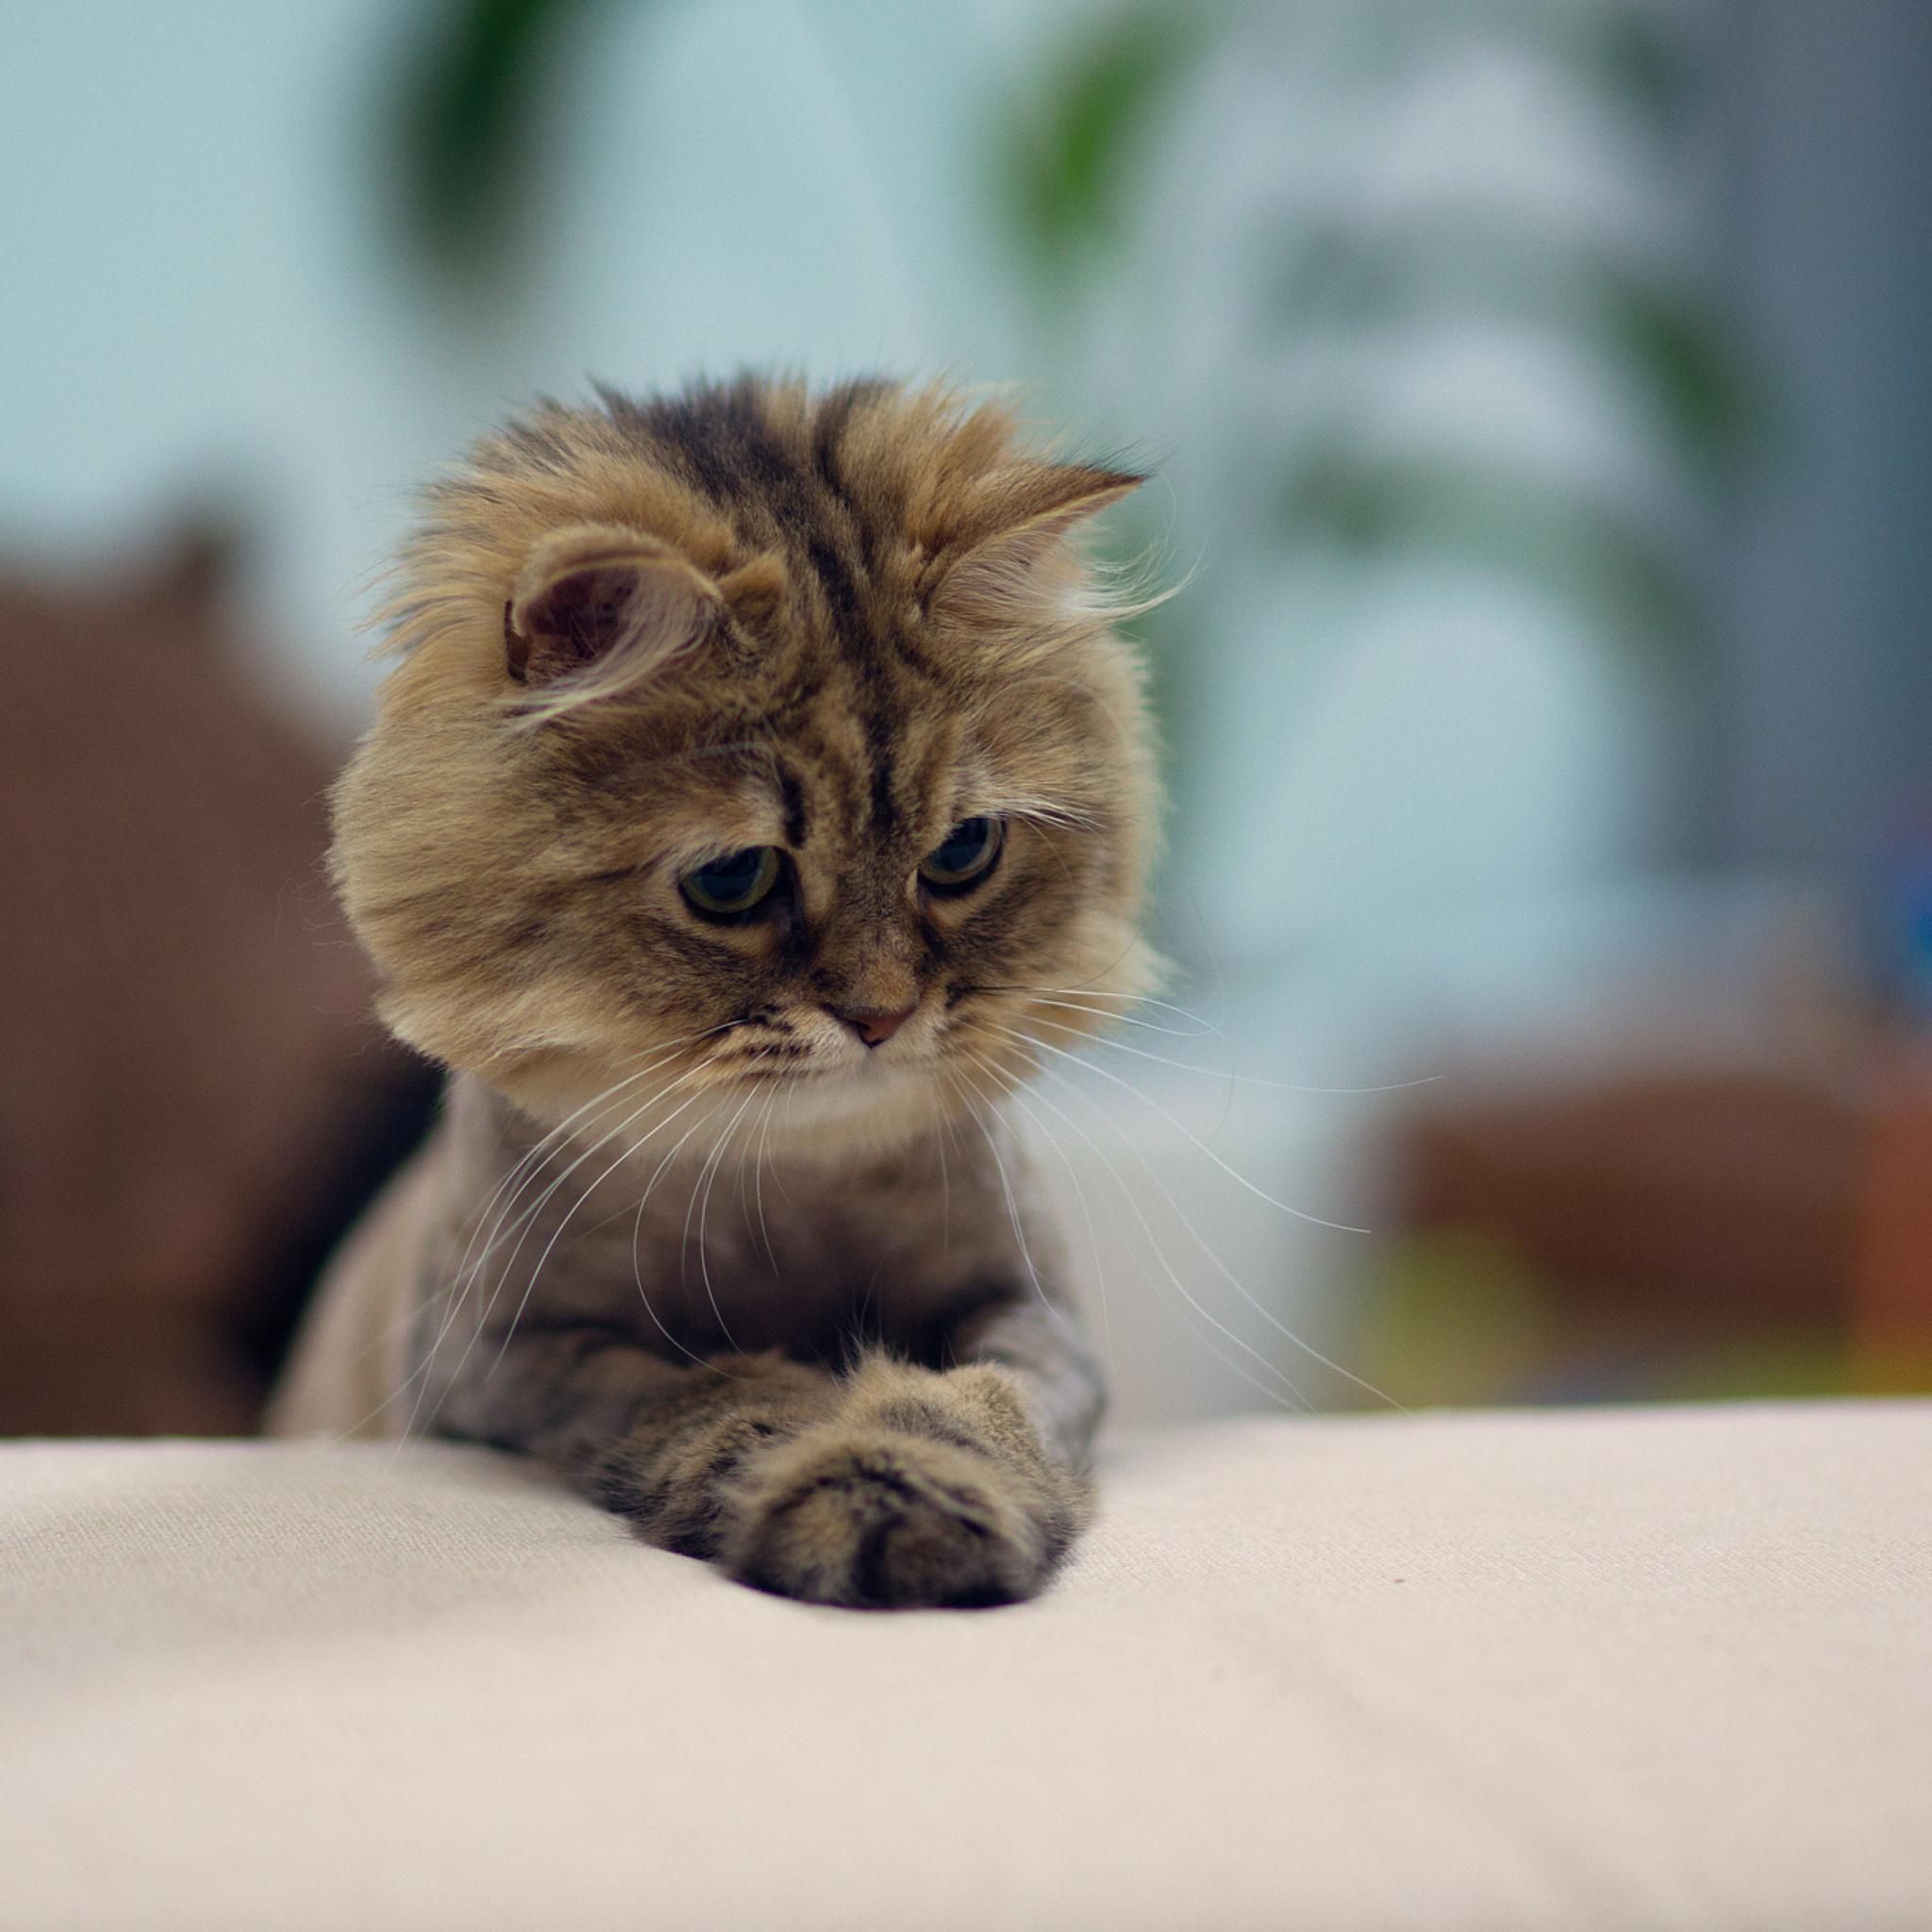 картинки котики просят часто натыкаюсь рекламу